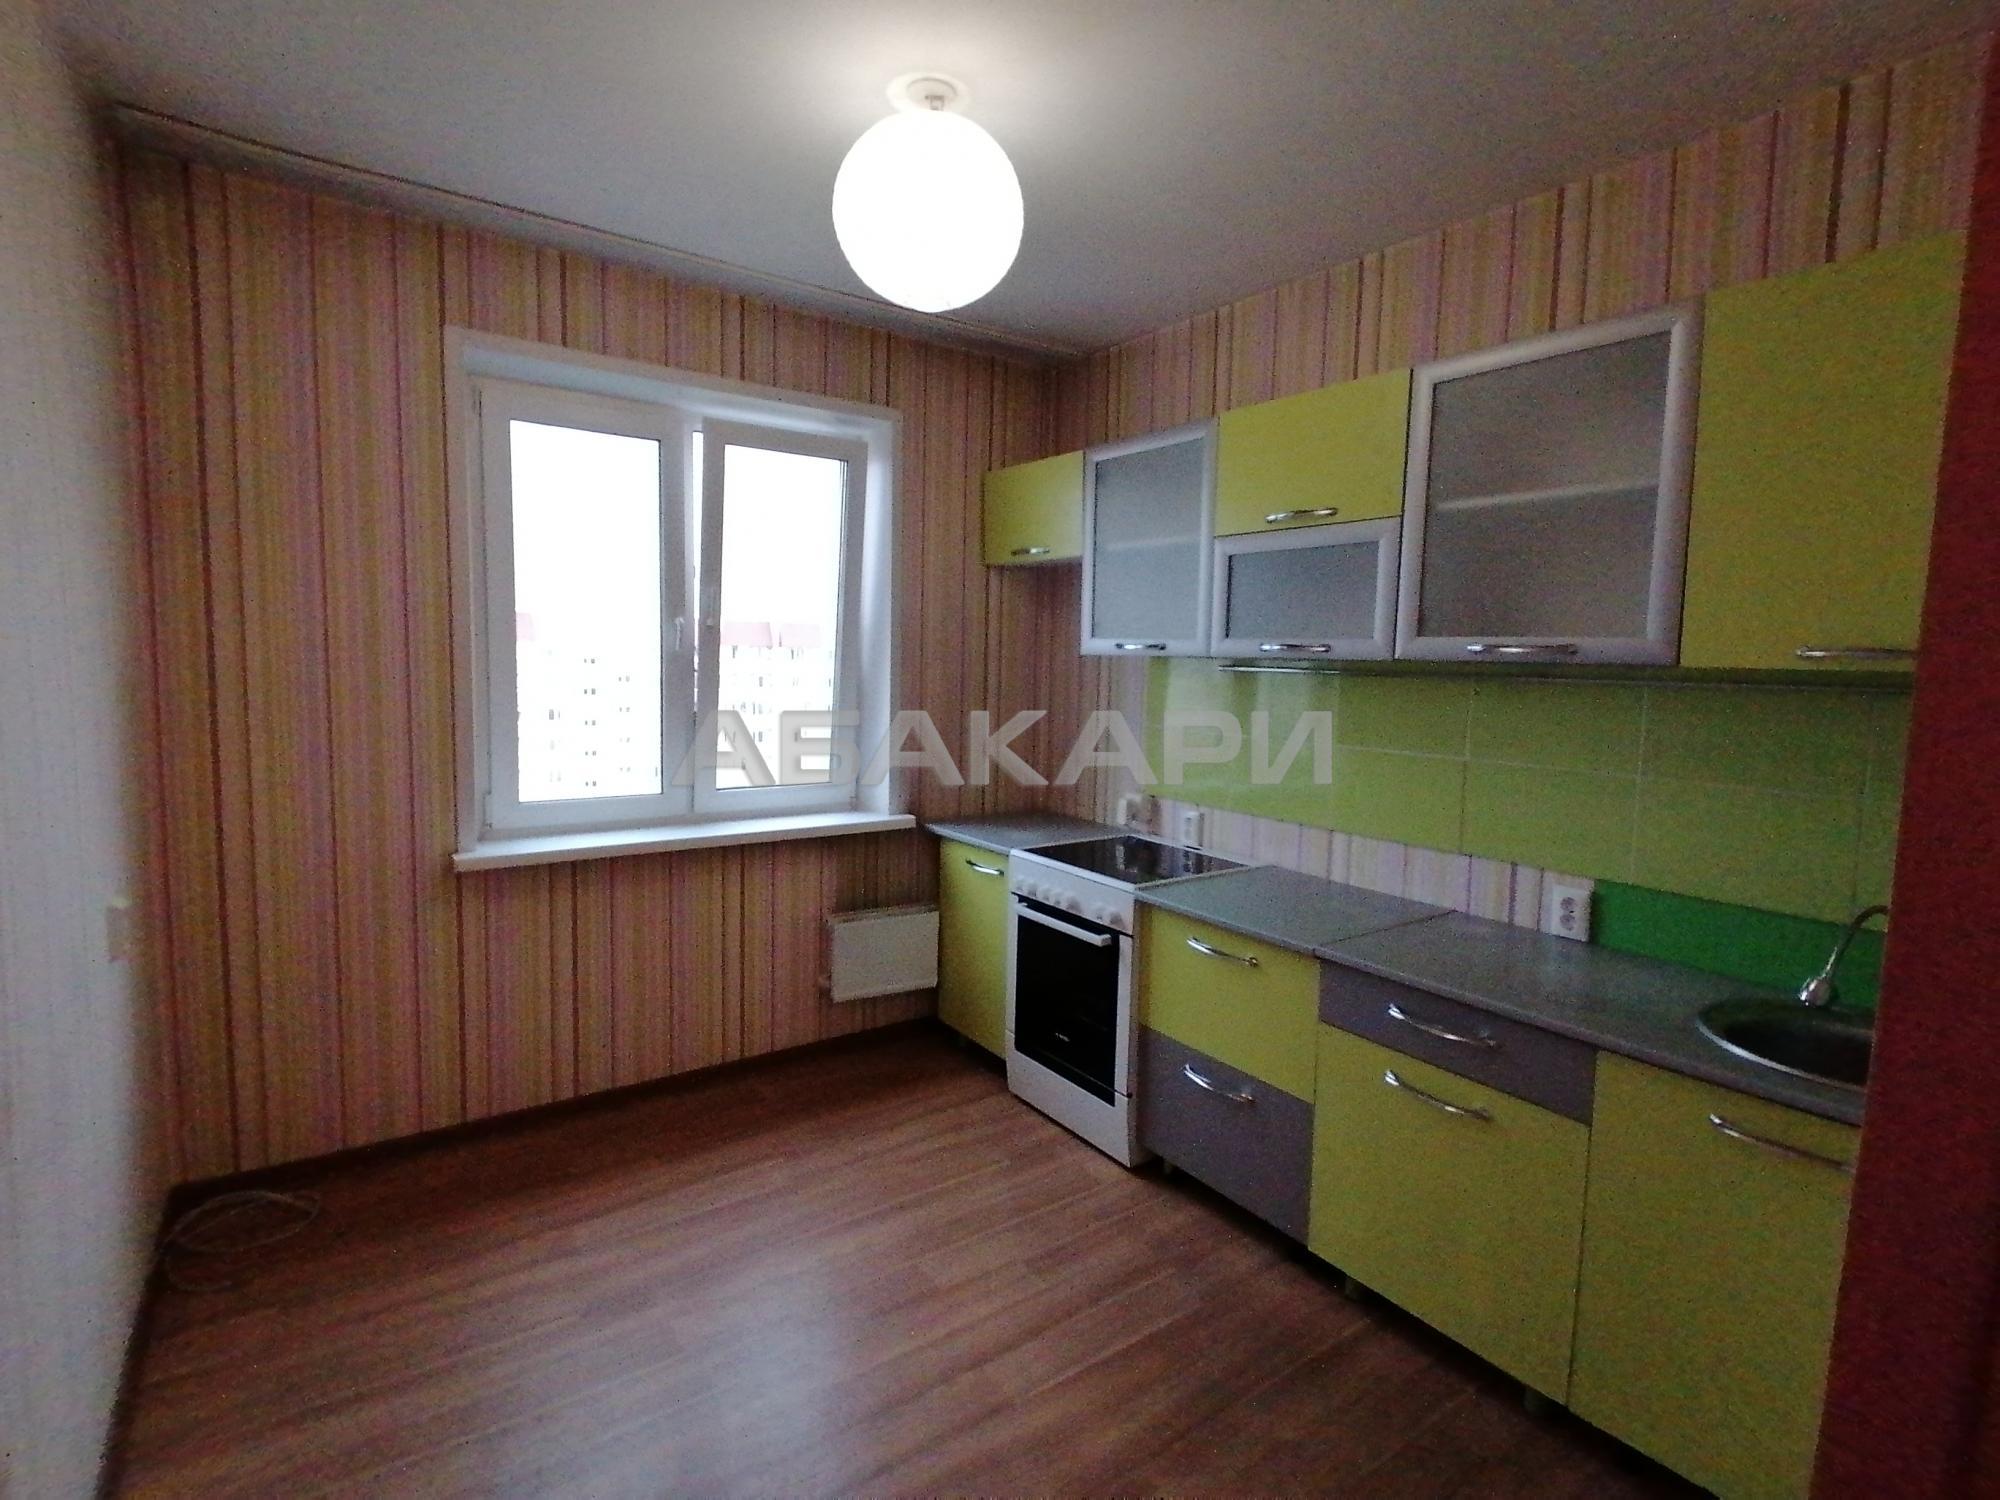 1к квартира улица Мирошниченко, 20 10/10 - 41кв | 14000 | аренда в Красноярске фото 1